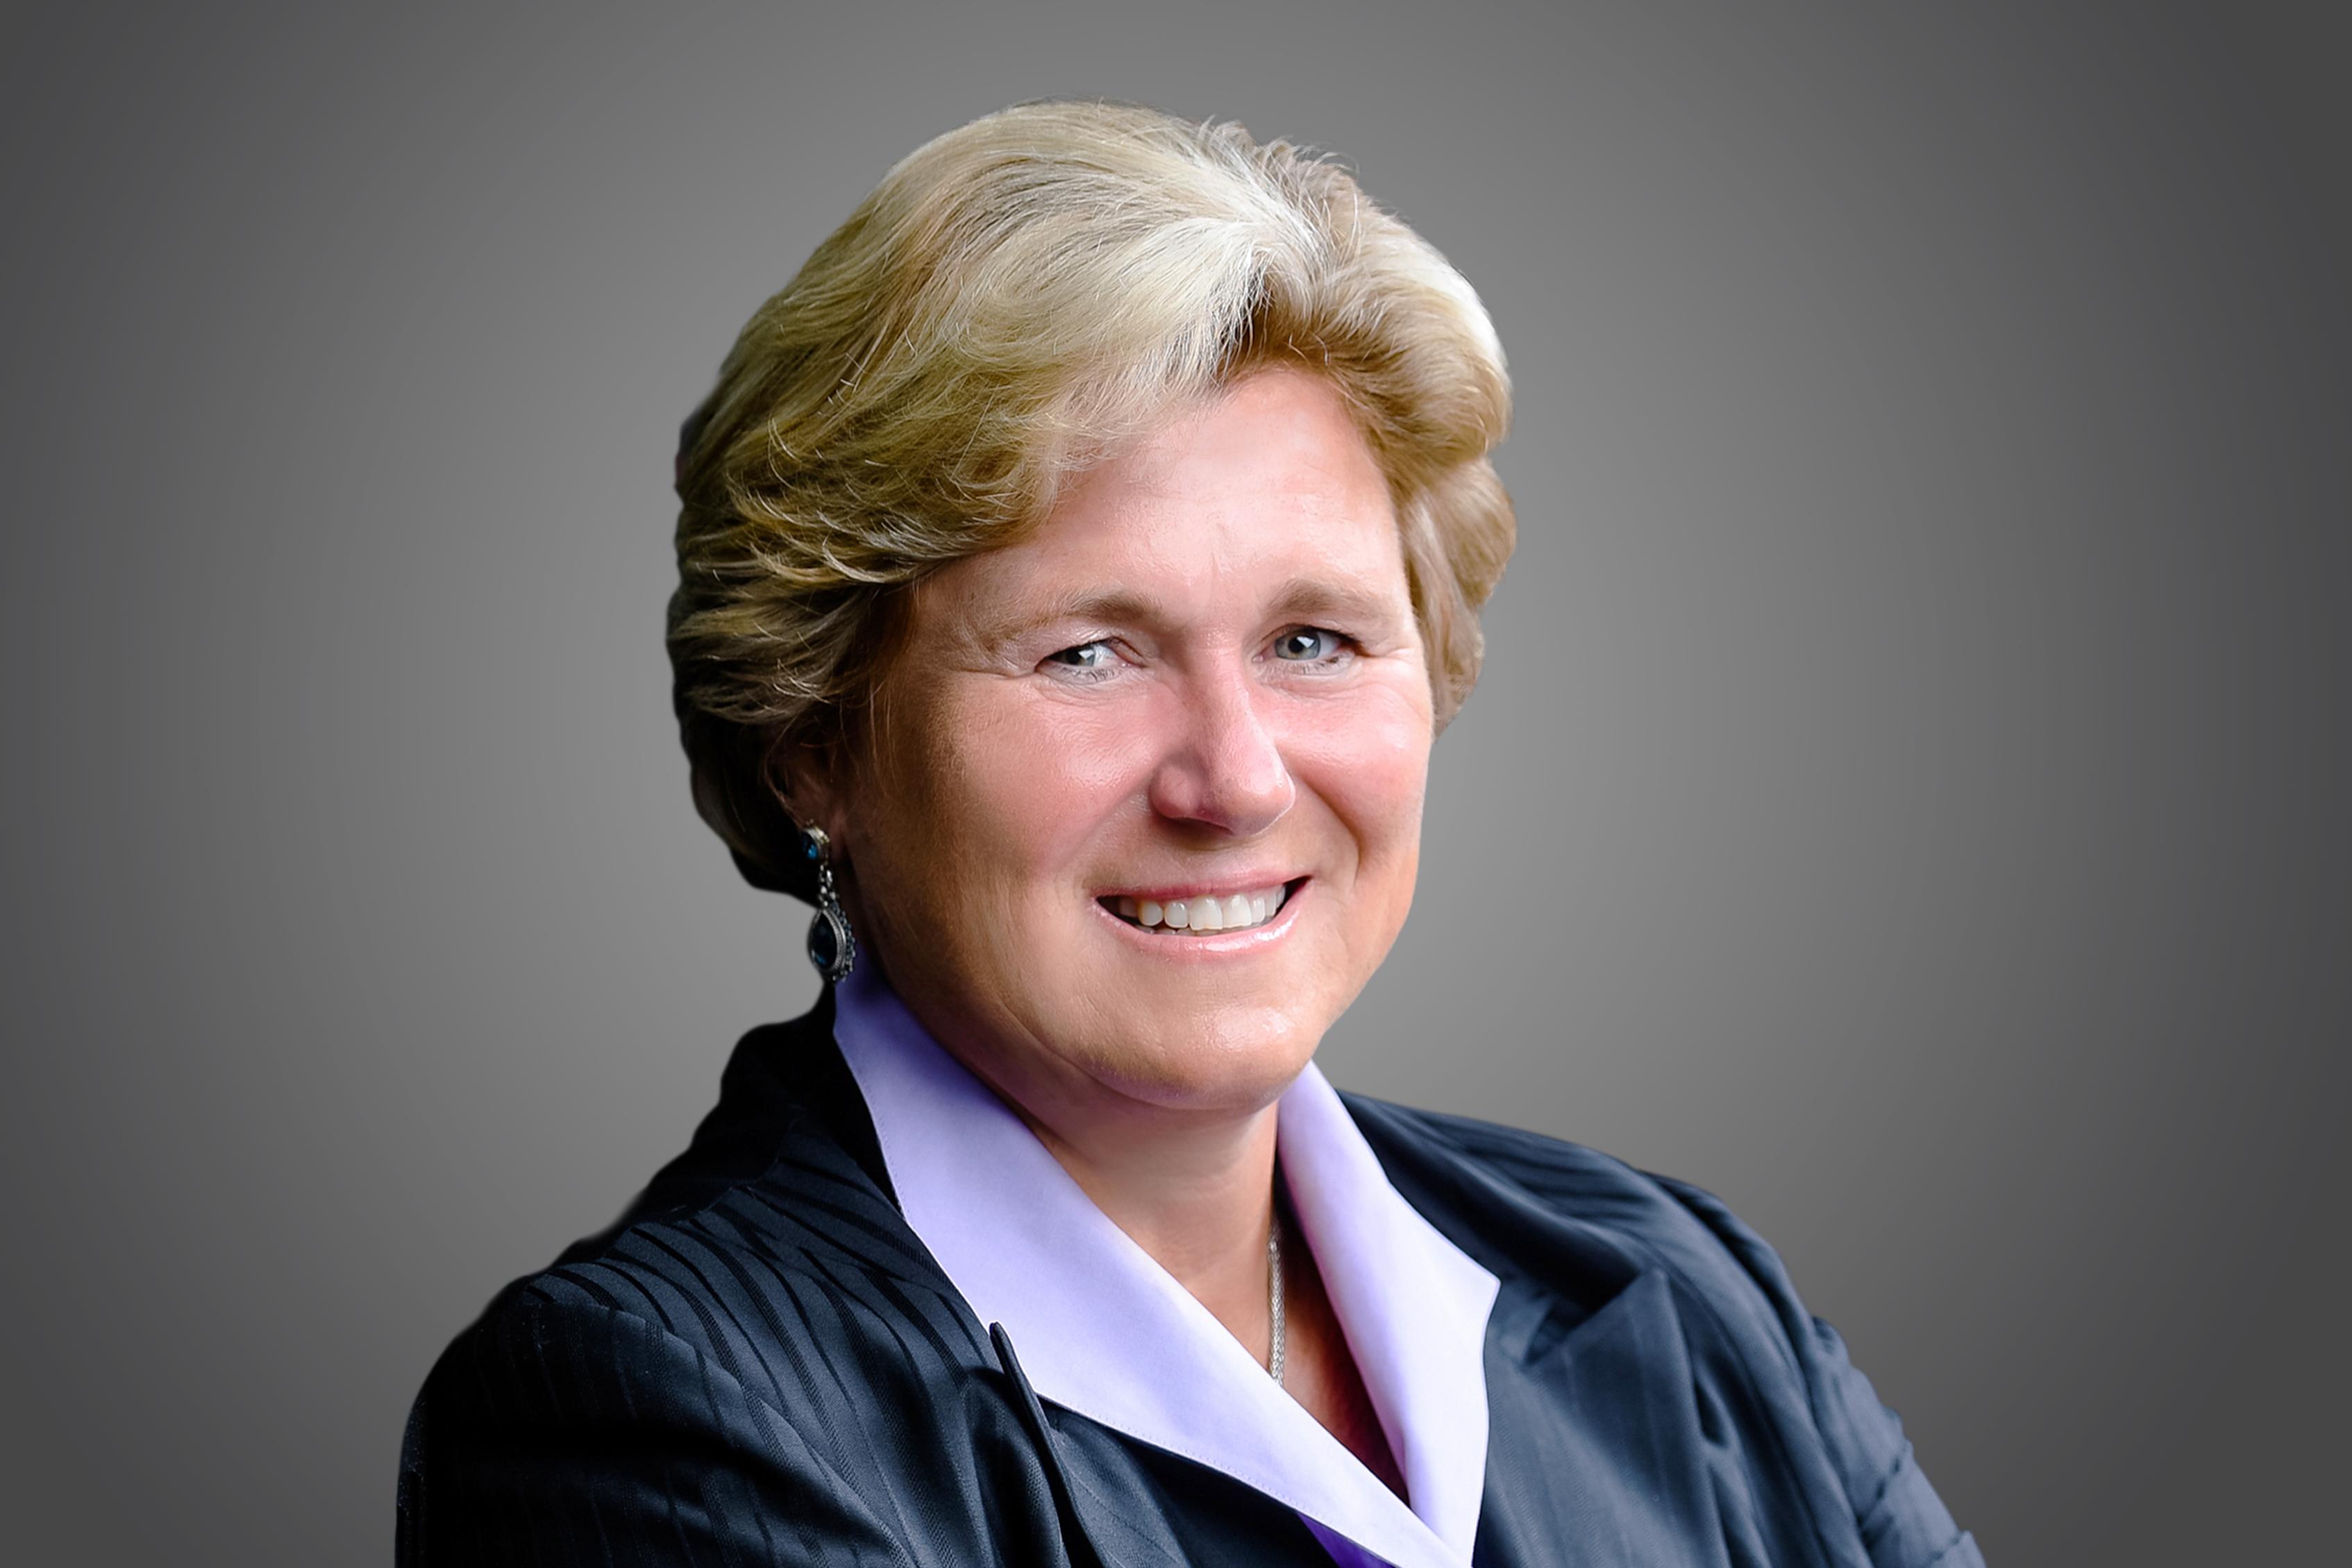 women in healthcare Gail Koziara Boudreaux